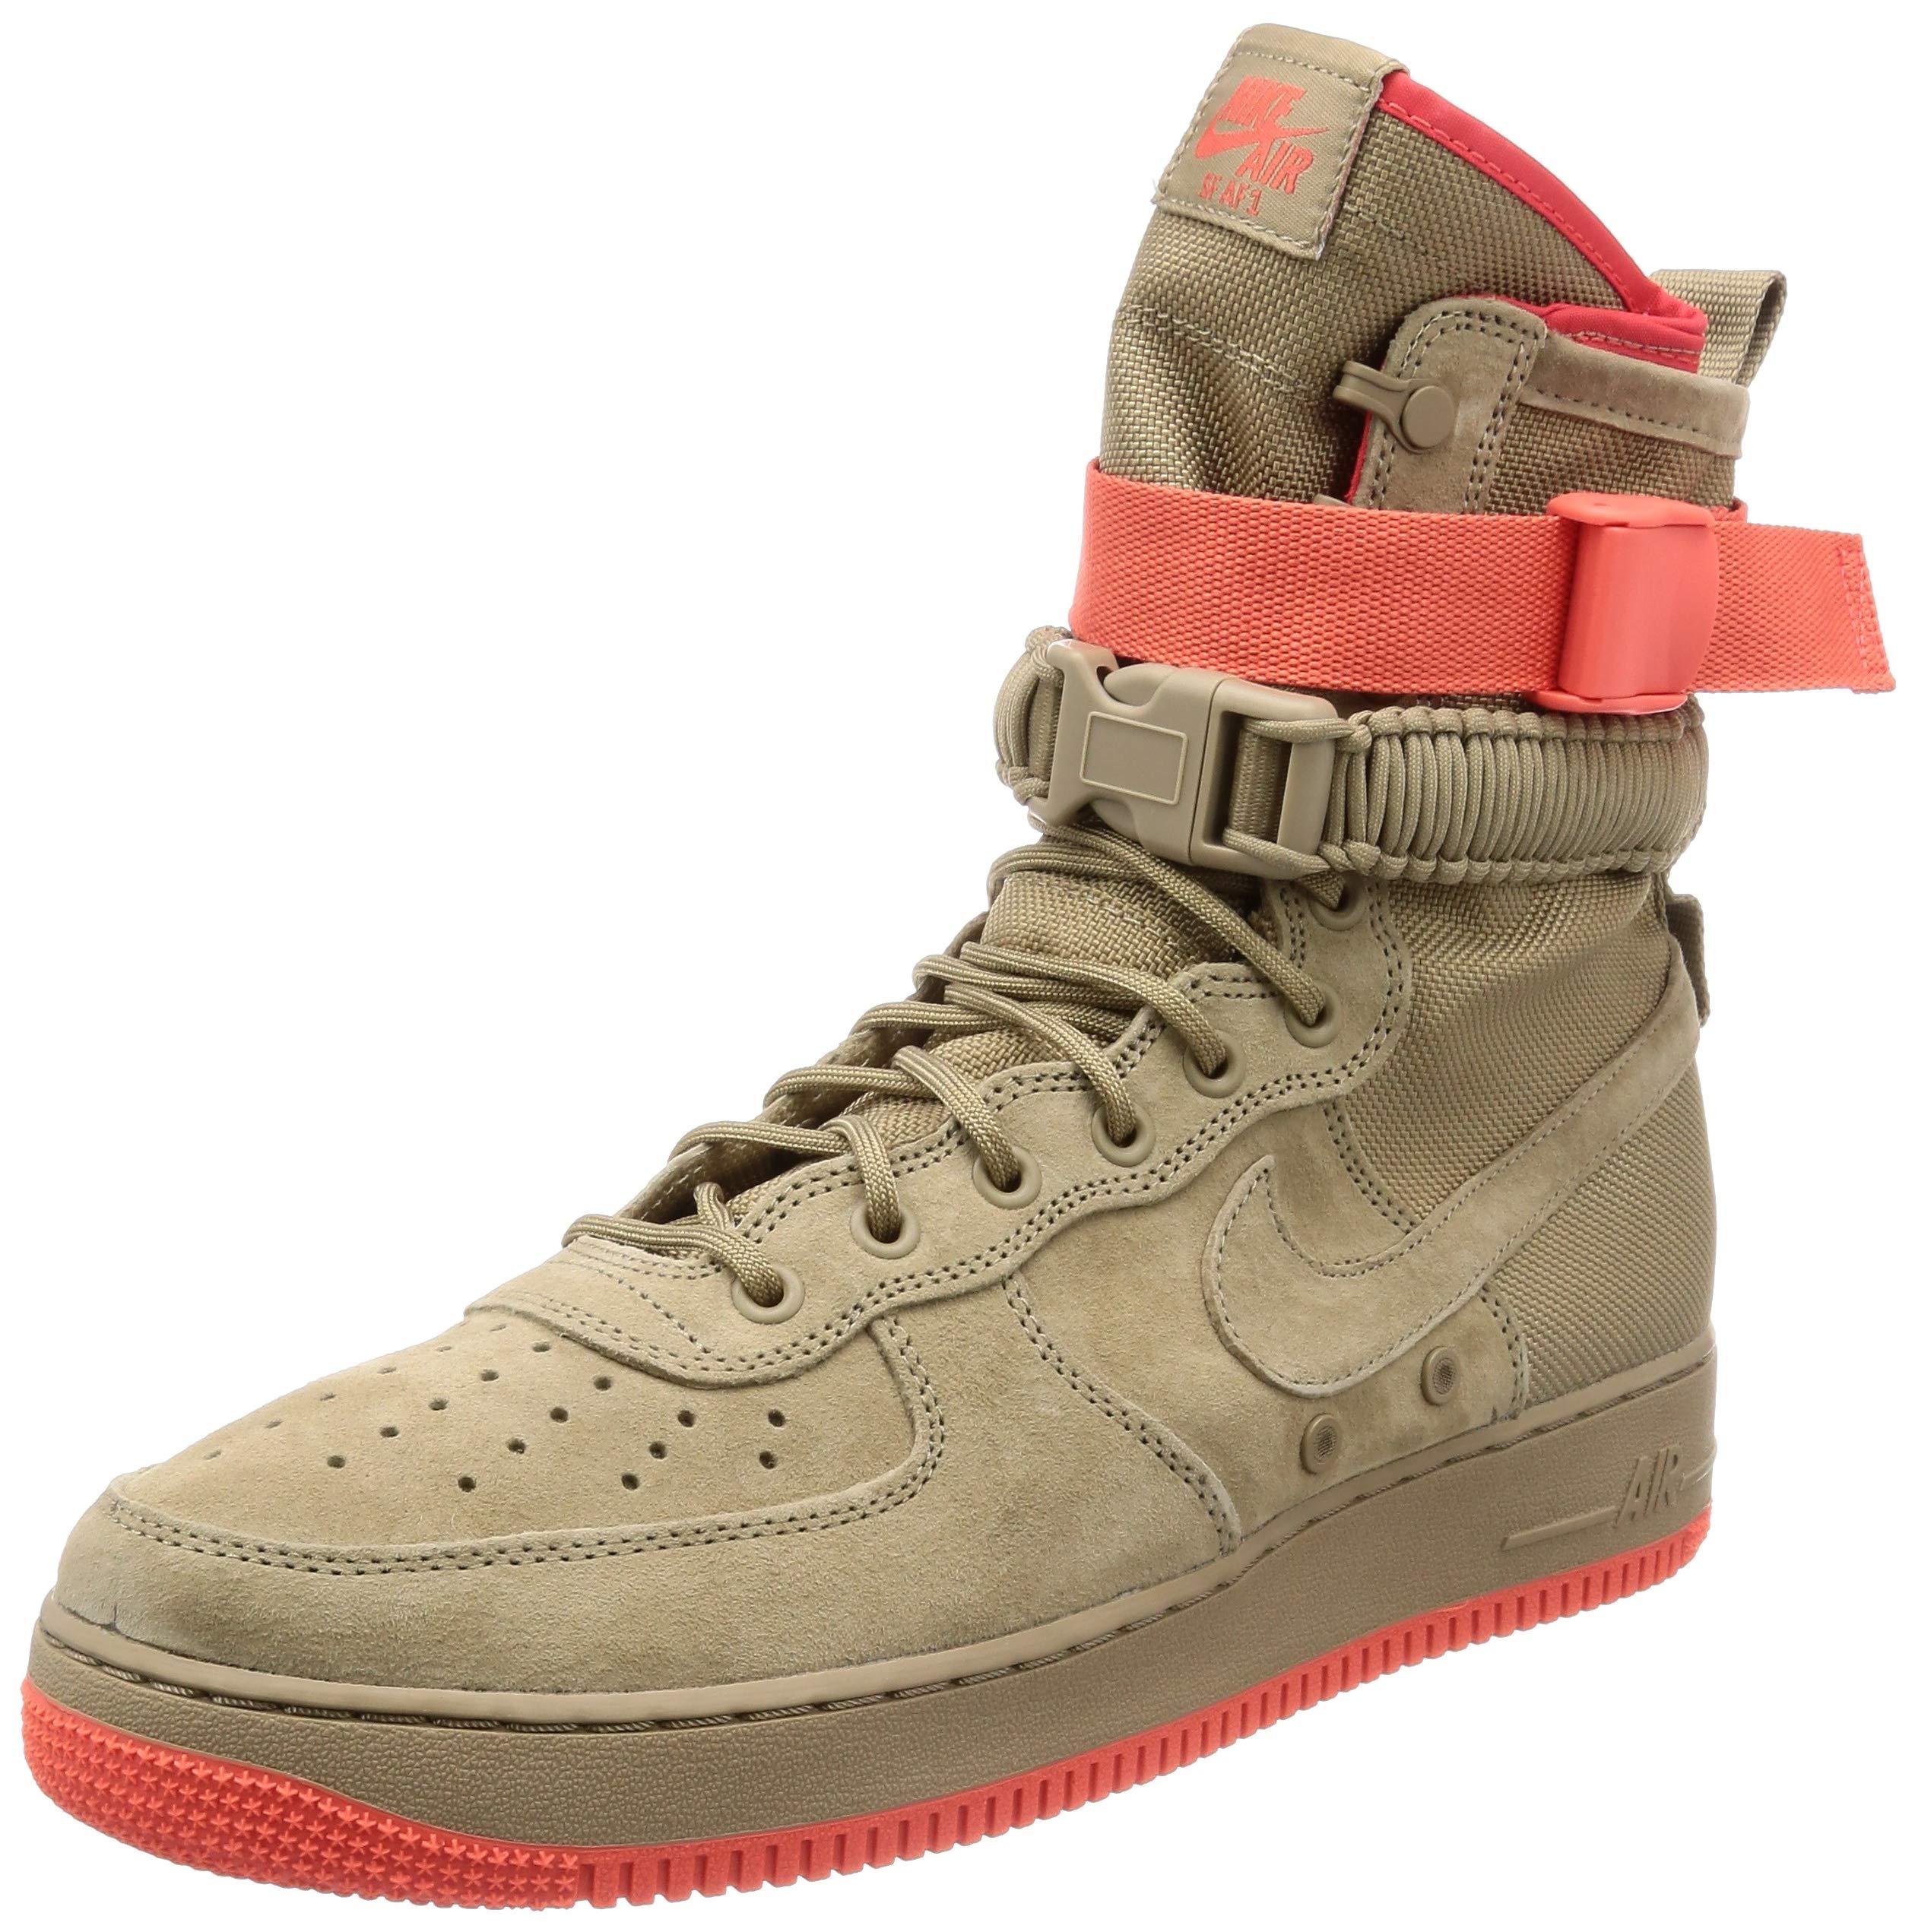 pretty nice 4921e 9c37f Nike SF AF1 High Men's Boots (8)